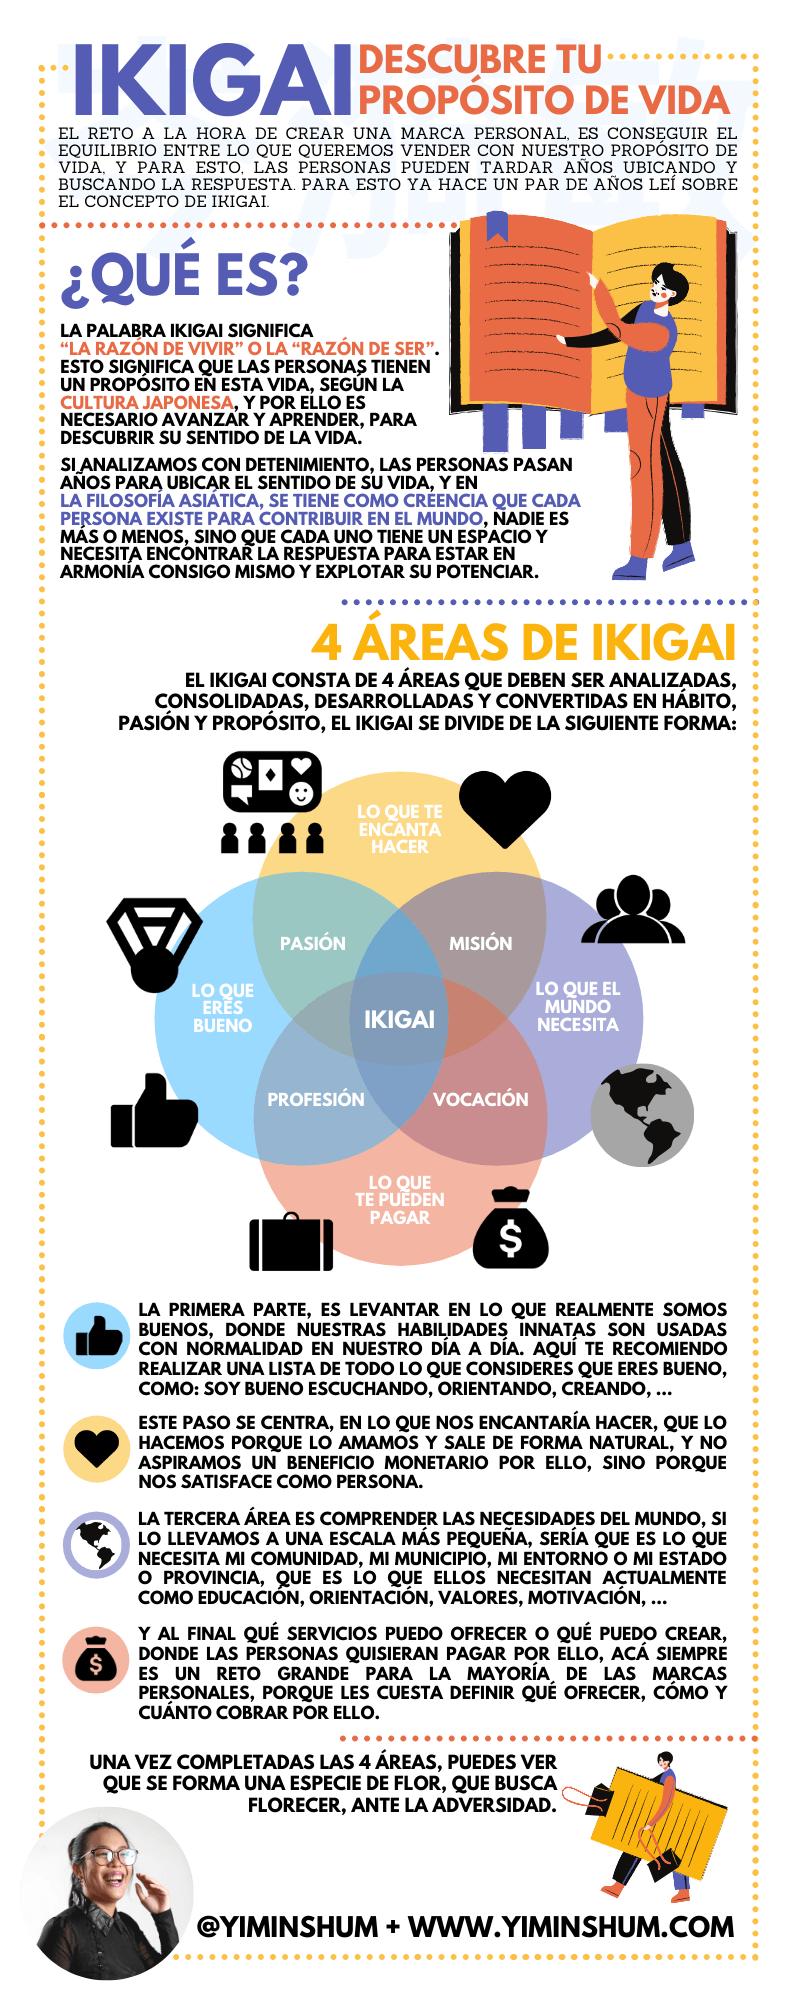 IKIGAI par tu Marca Personal #infografia #infographic #marcapersonal